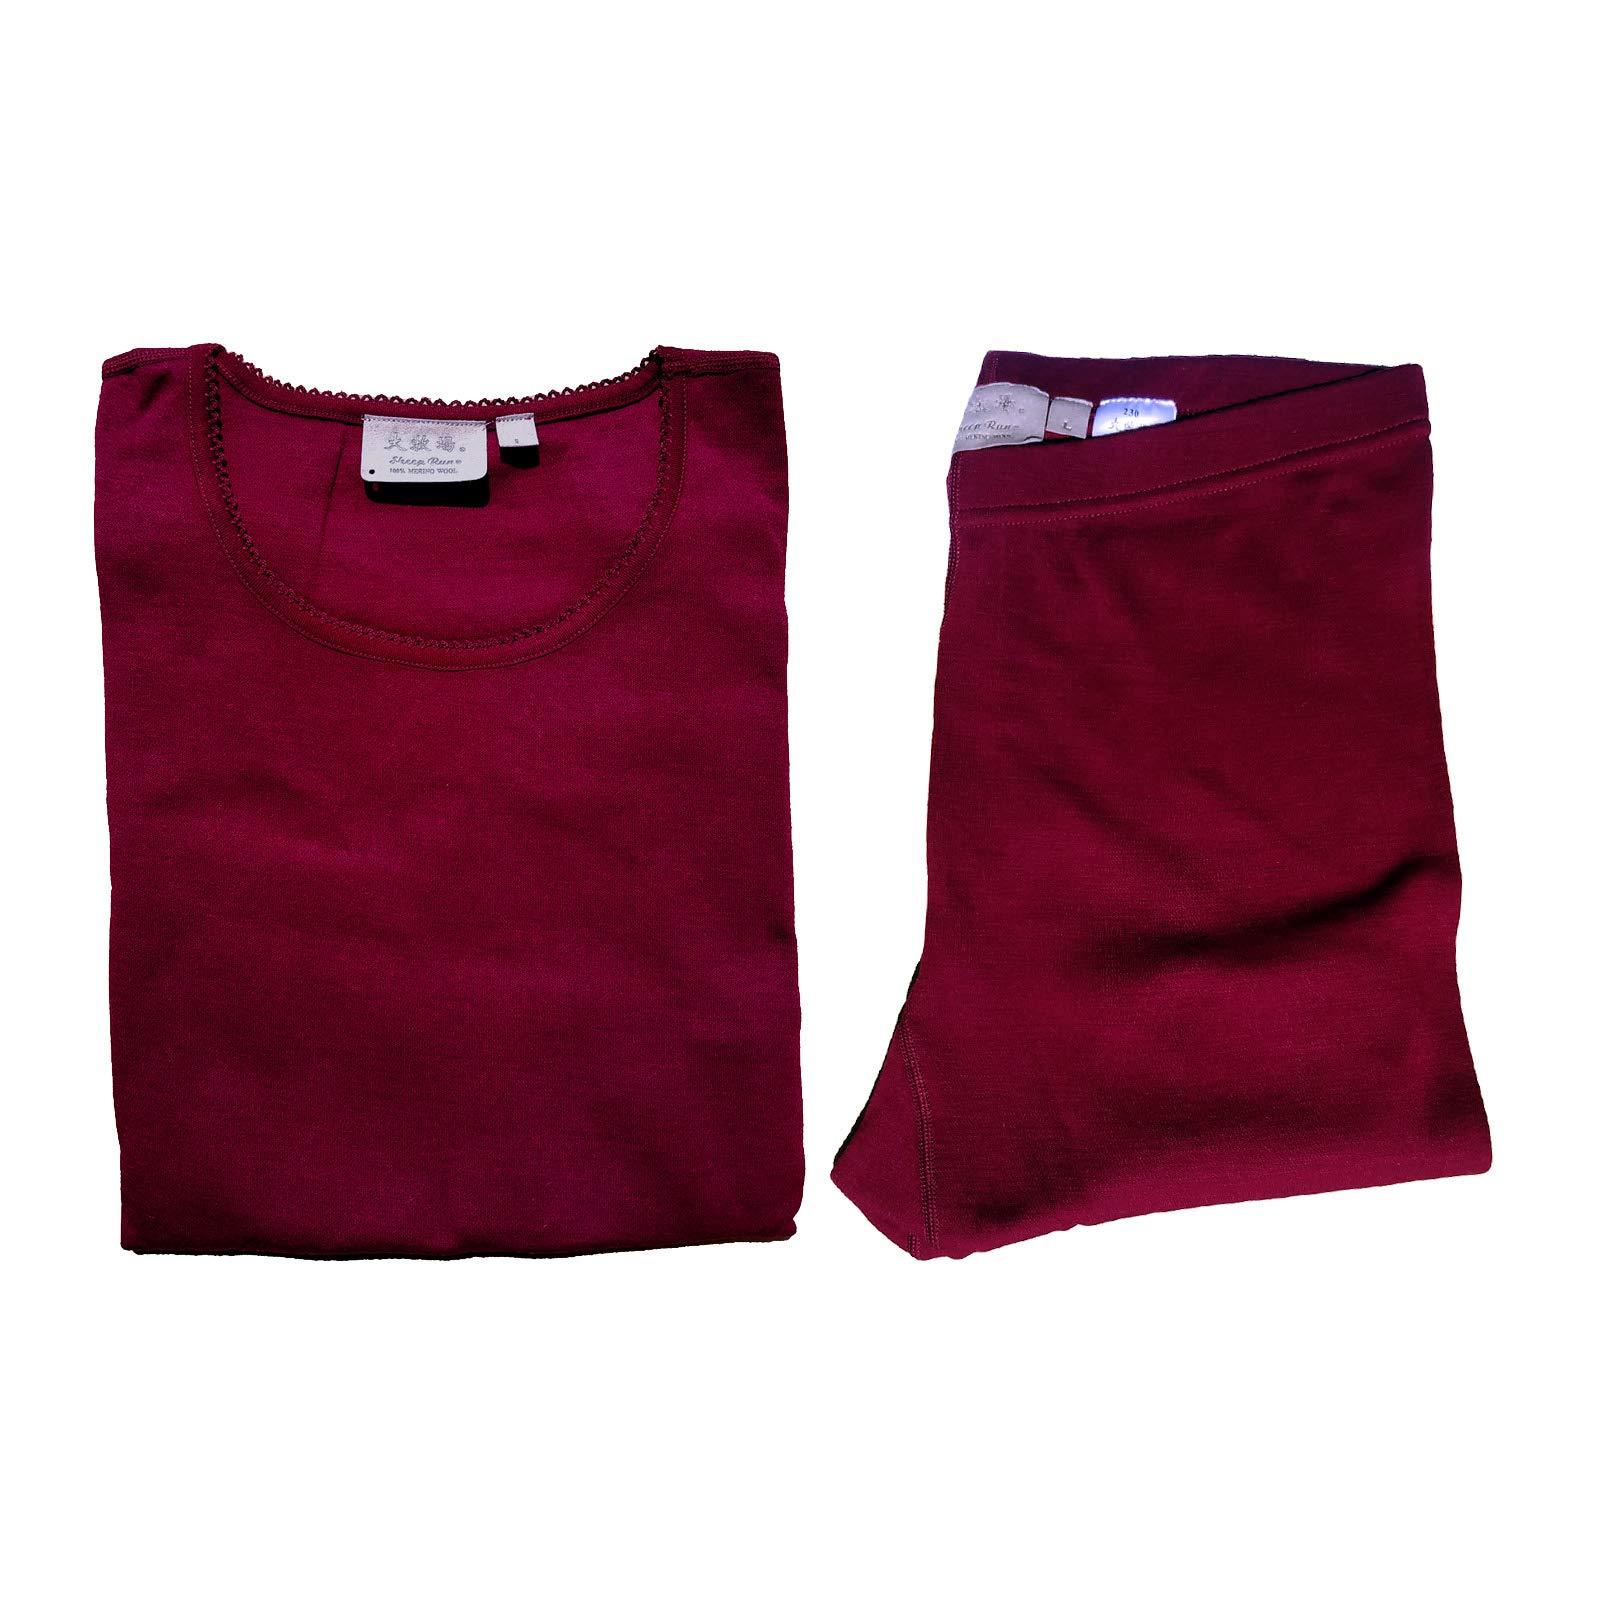 Sheep Run Womens 100% Merino Wool Thermal Underwear Top and Pants (Wine, Small) by Sheep Run